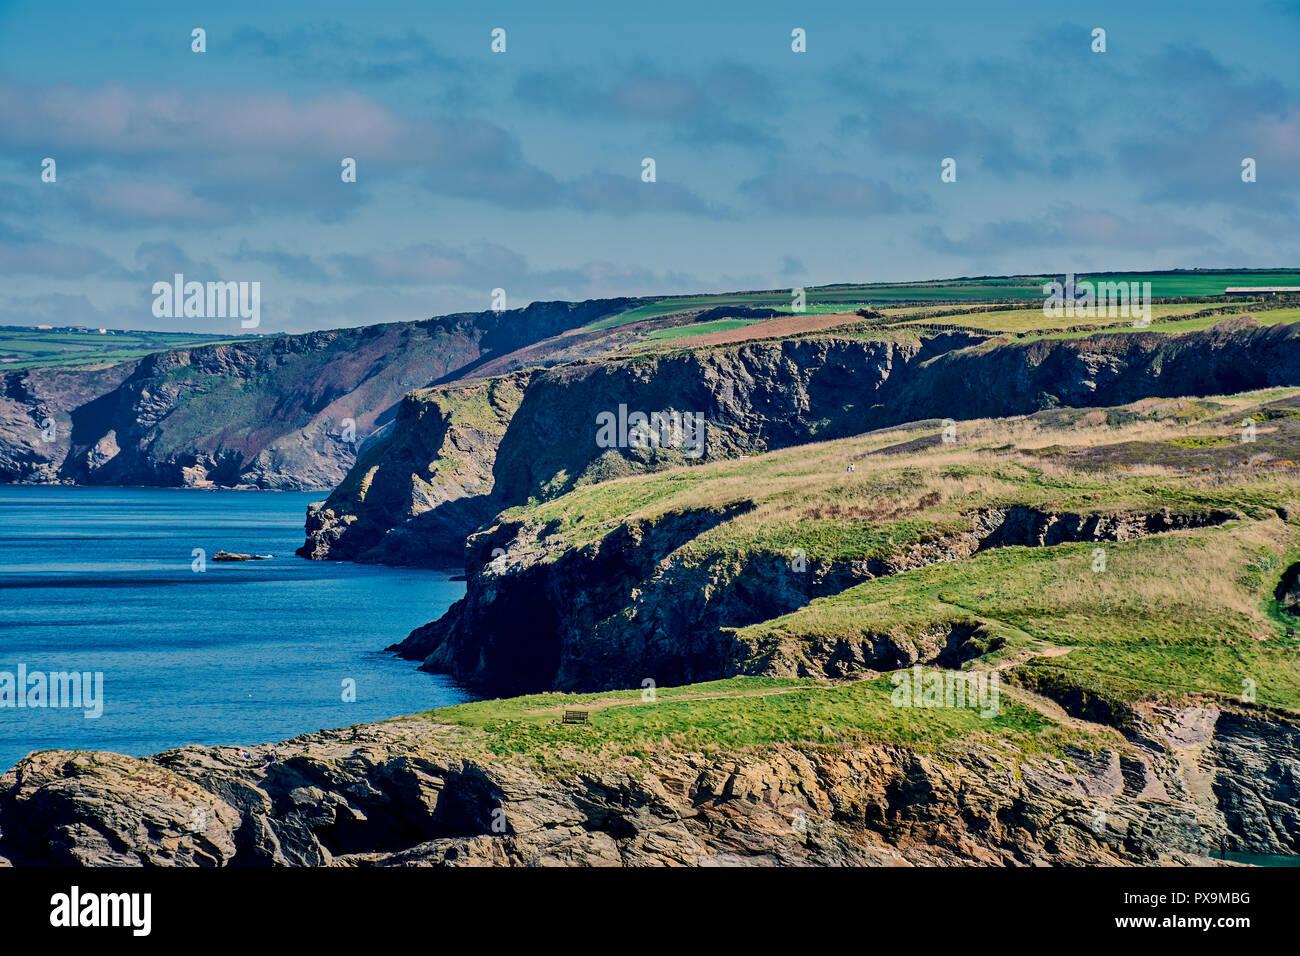 beautiful Cornish coast landscape on the way to Port Isaac, North Cornwall, England - Stock Image